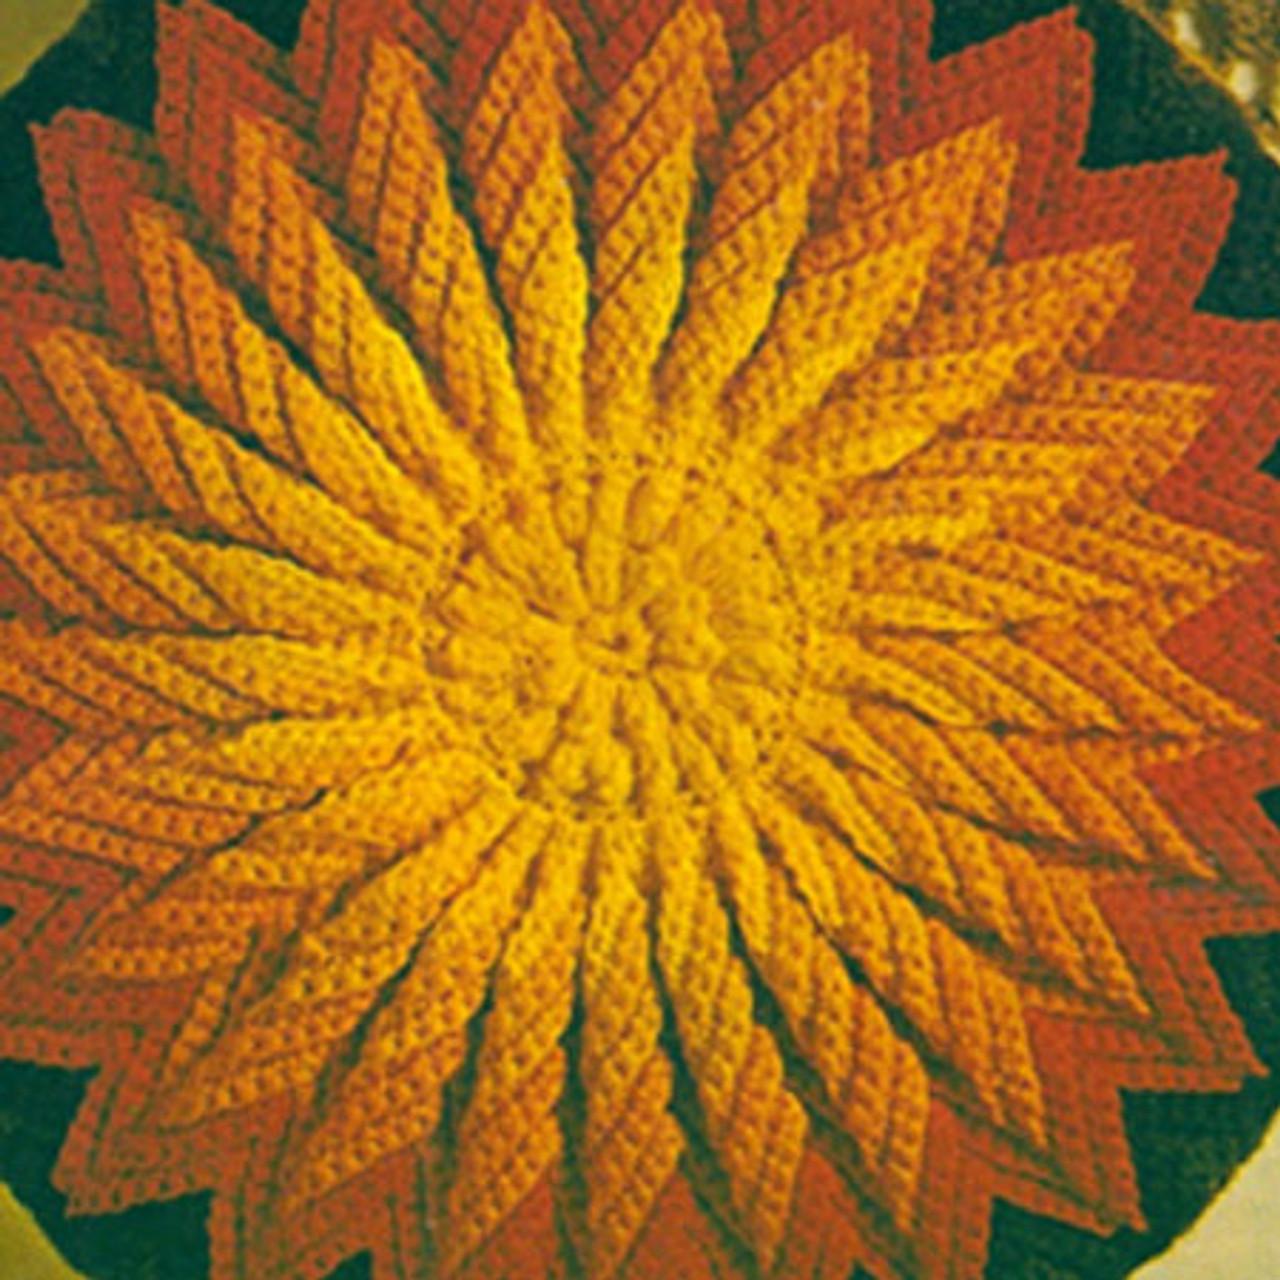 Crochet Sunburst Pillow Pattern